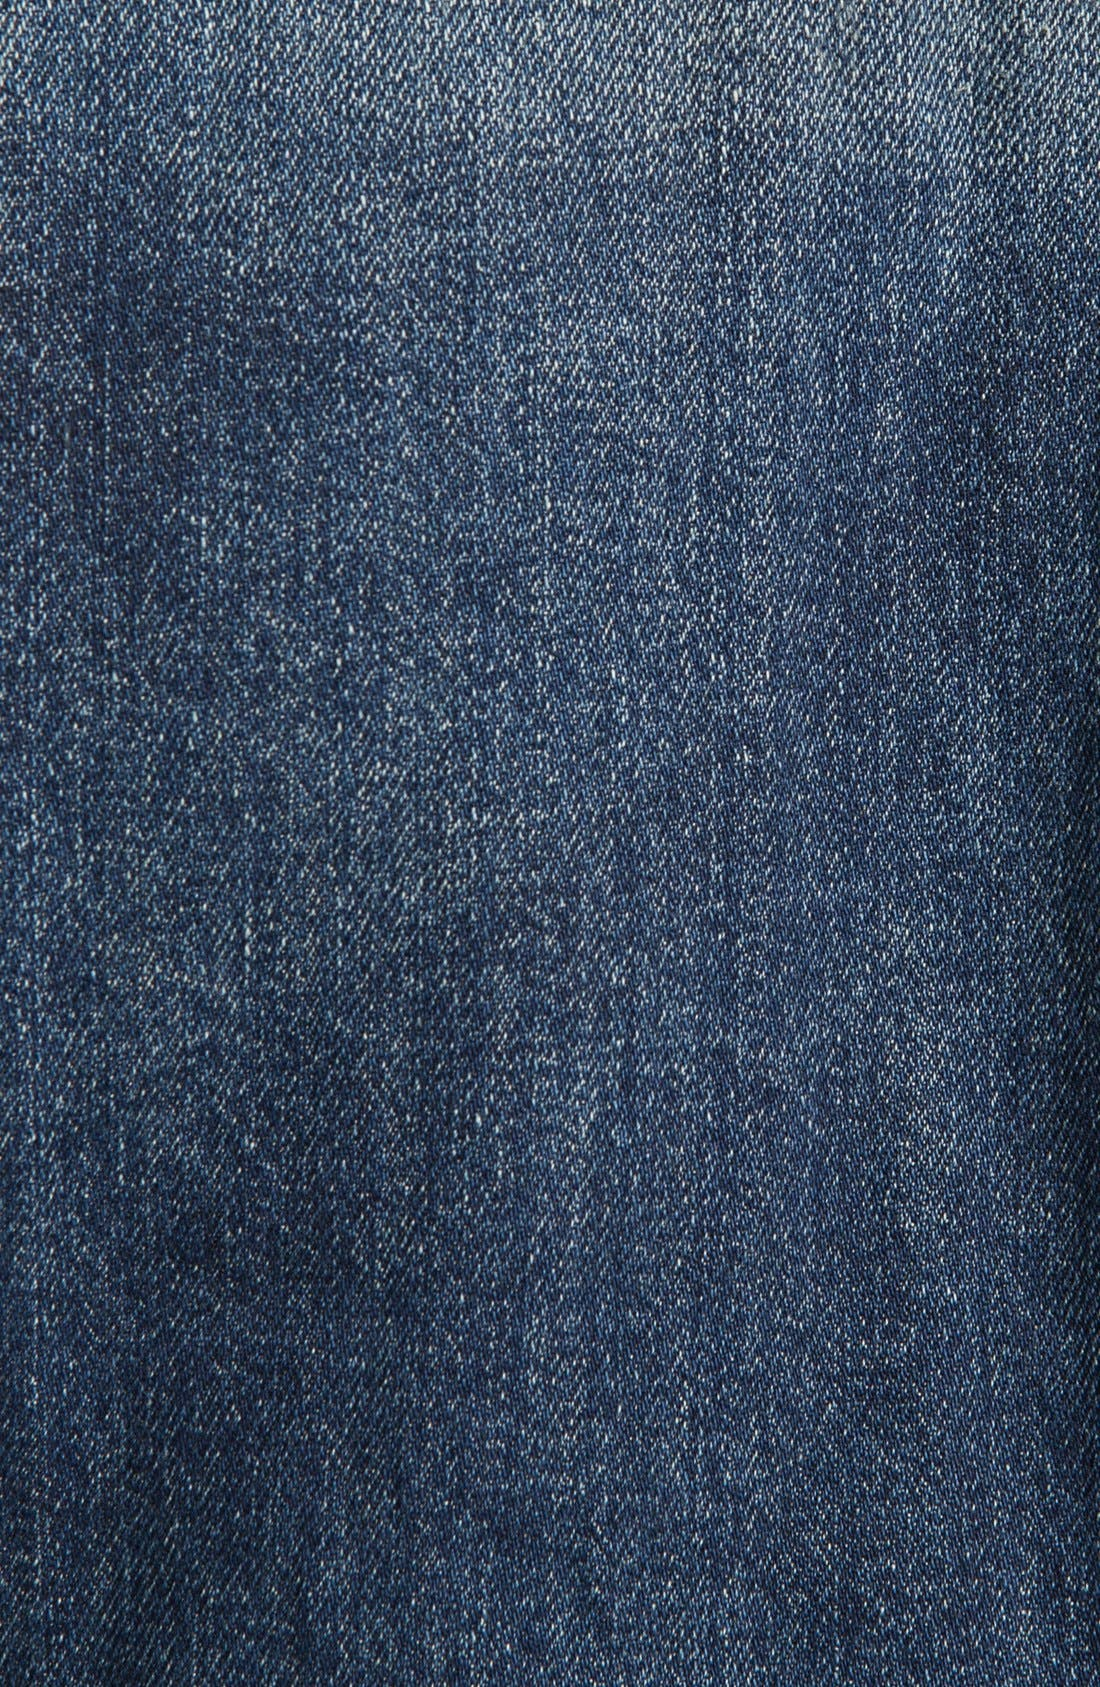 Alternate Image 3  - Nudie 'Sonny Organic Selvedge Dream' Denim Jacket